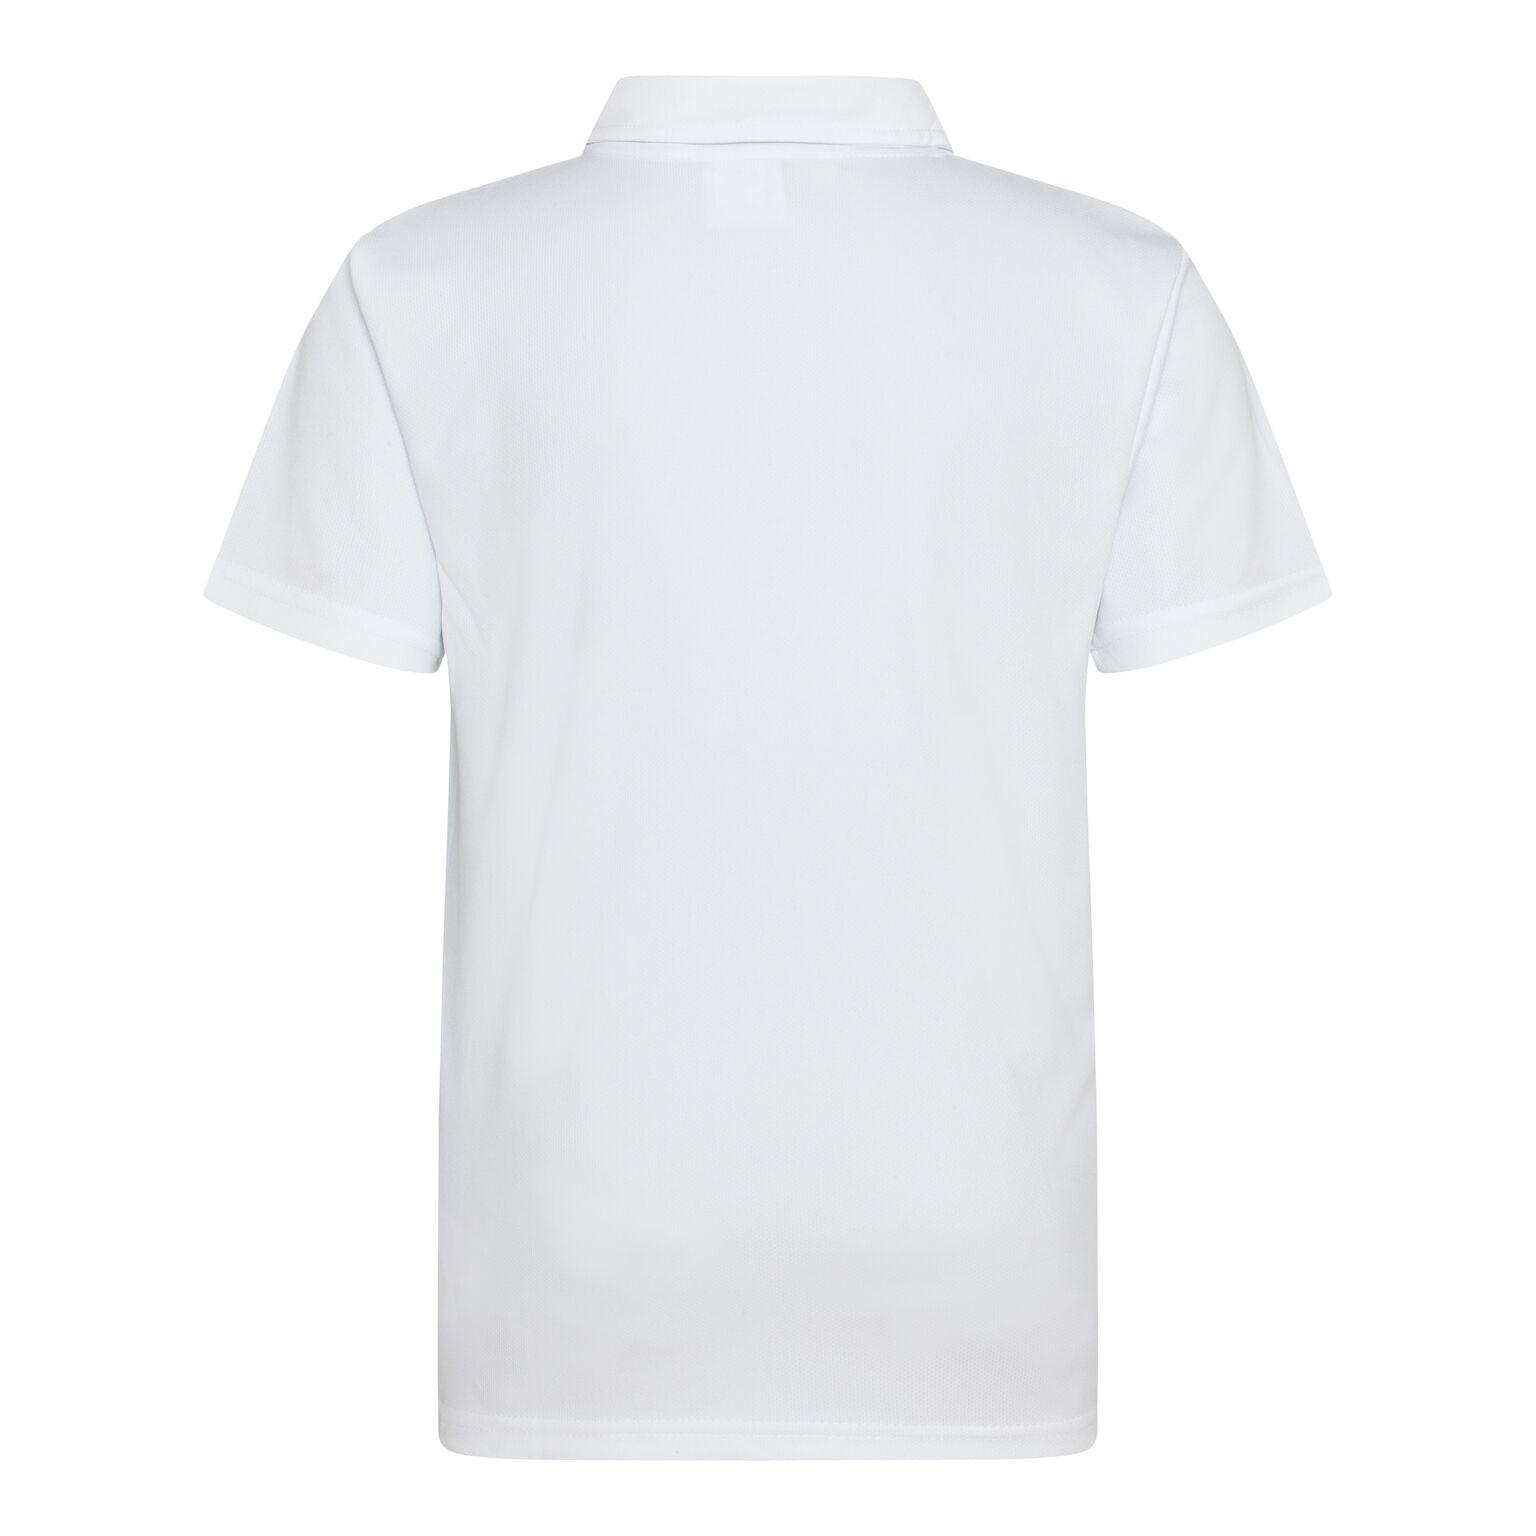 05_jc40j_blanc--0-0--8c20f602-407c-411d-891c-8ee97fee4d54